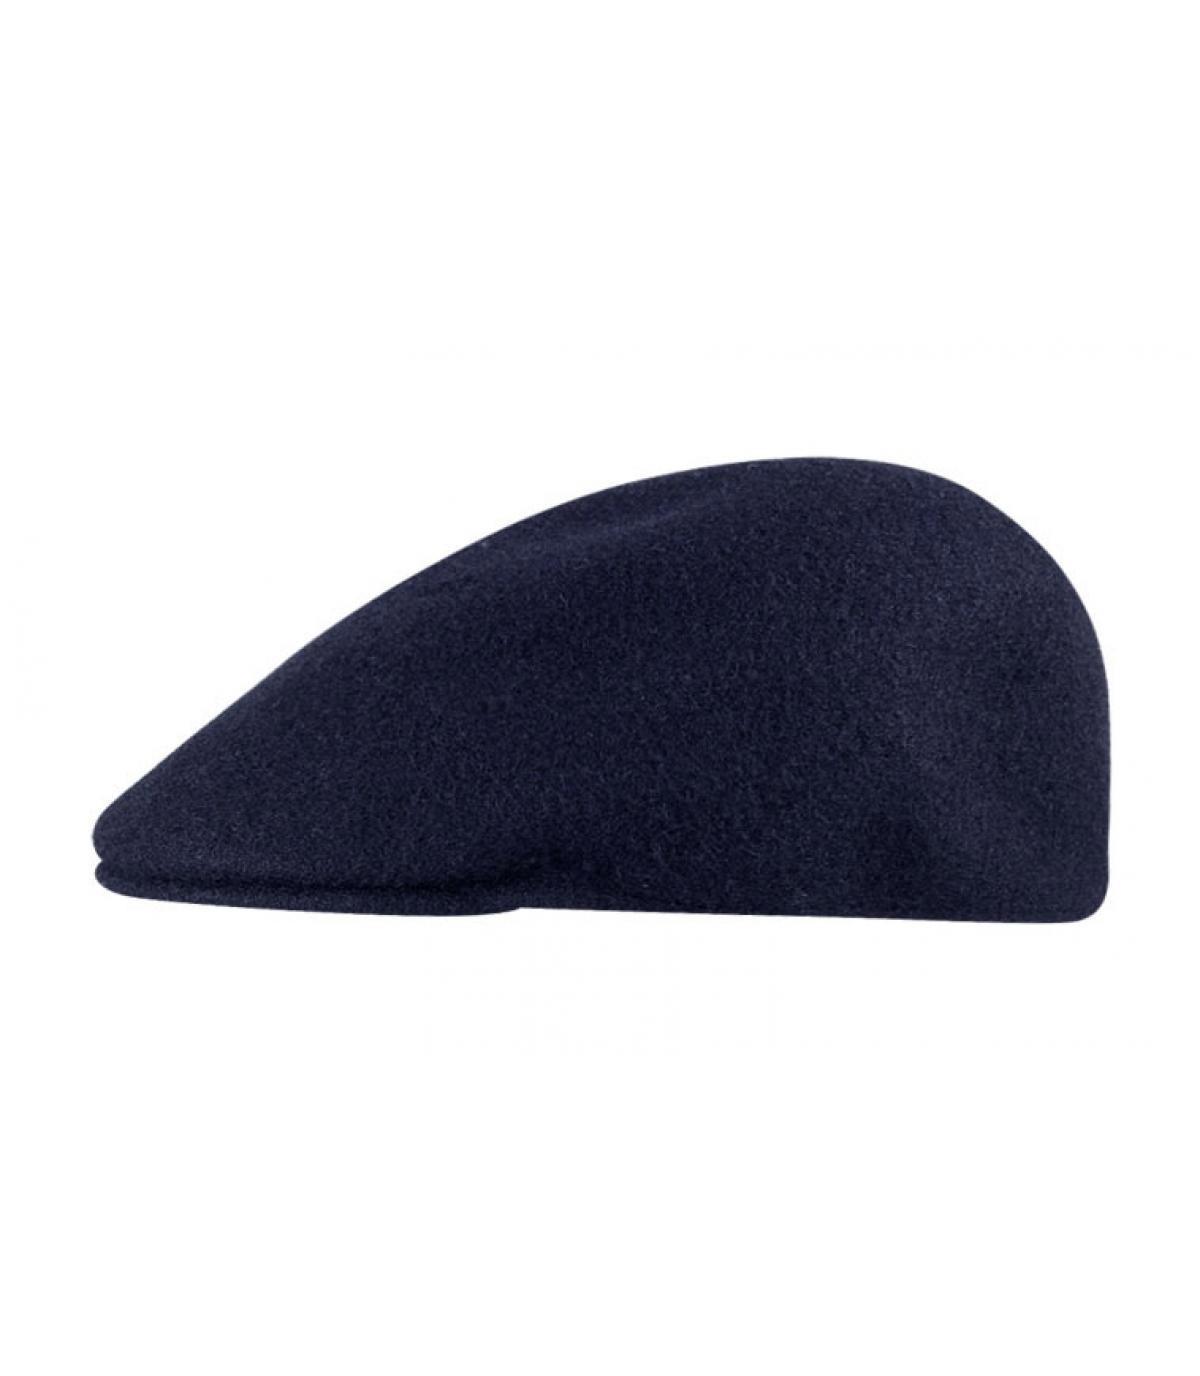 Detalles 507 wool seamless navy imagen 3